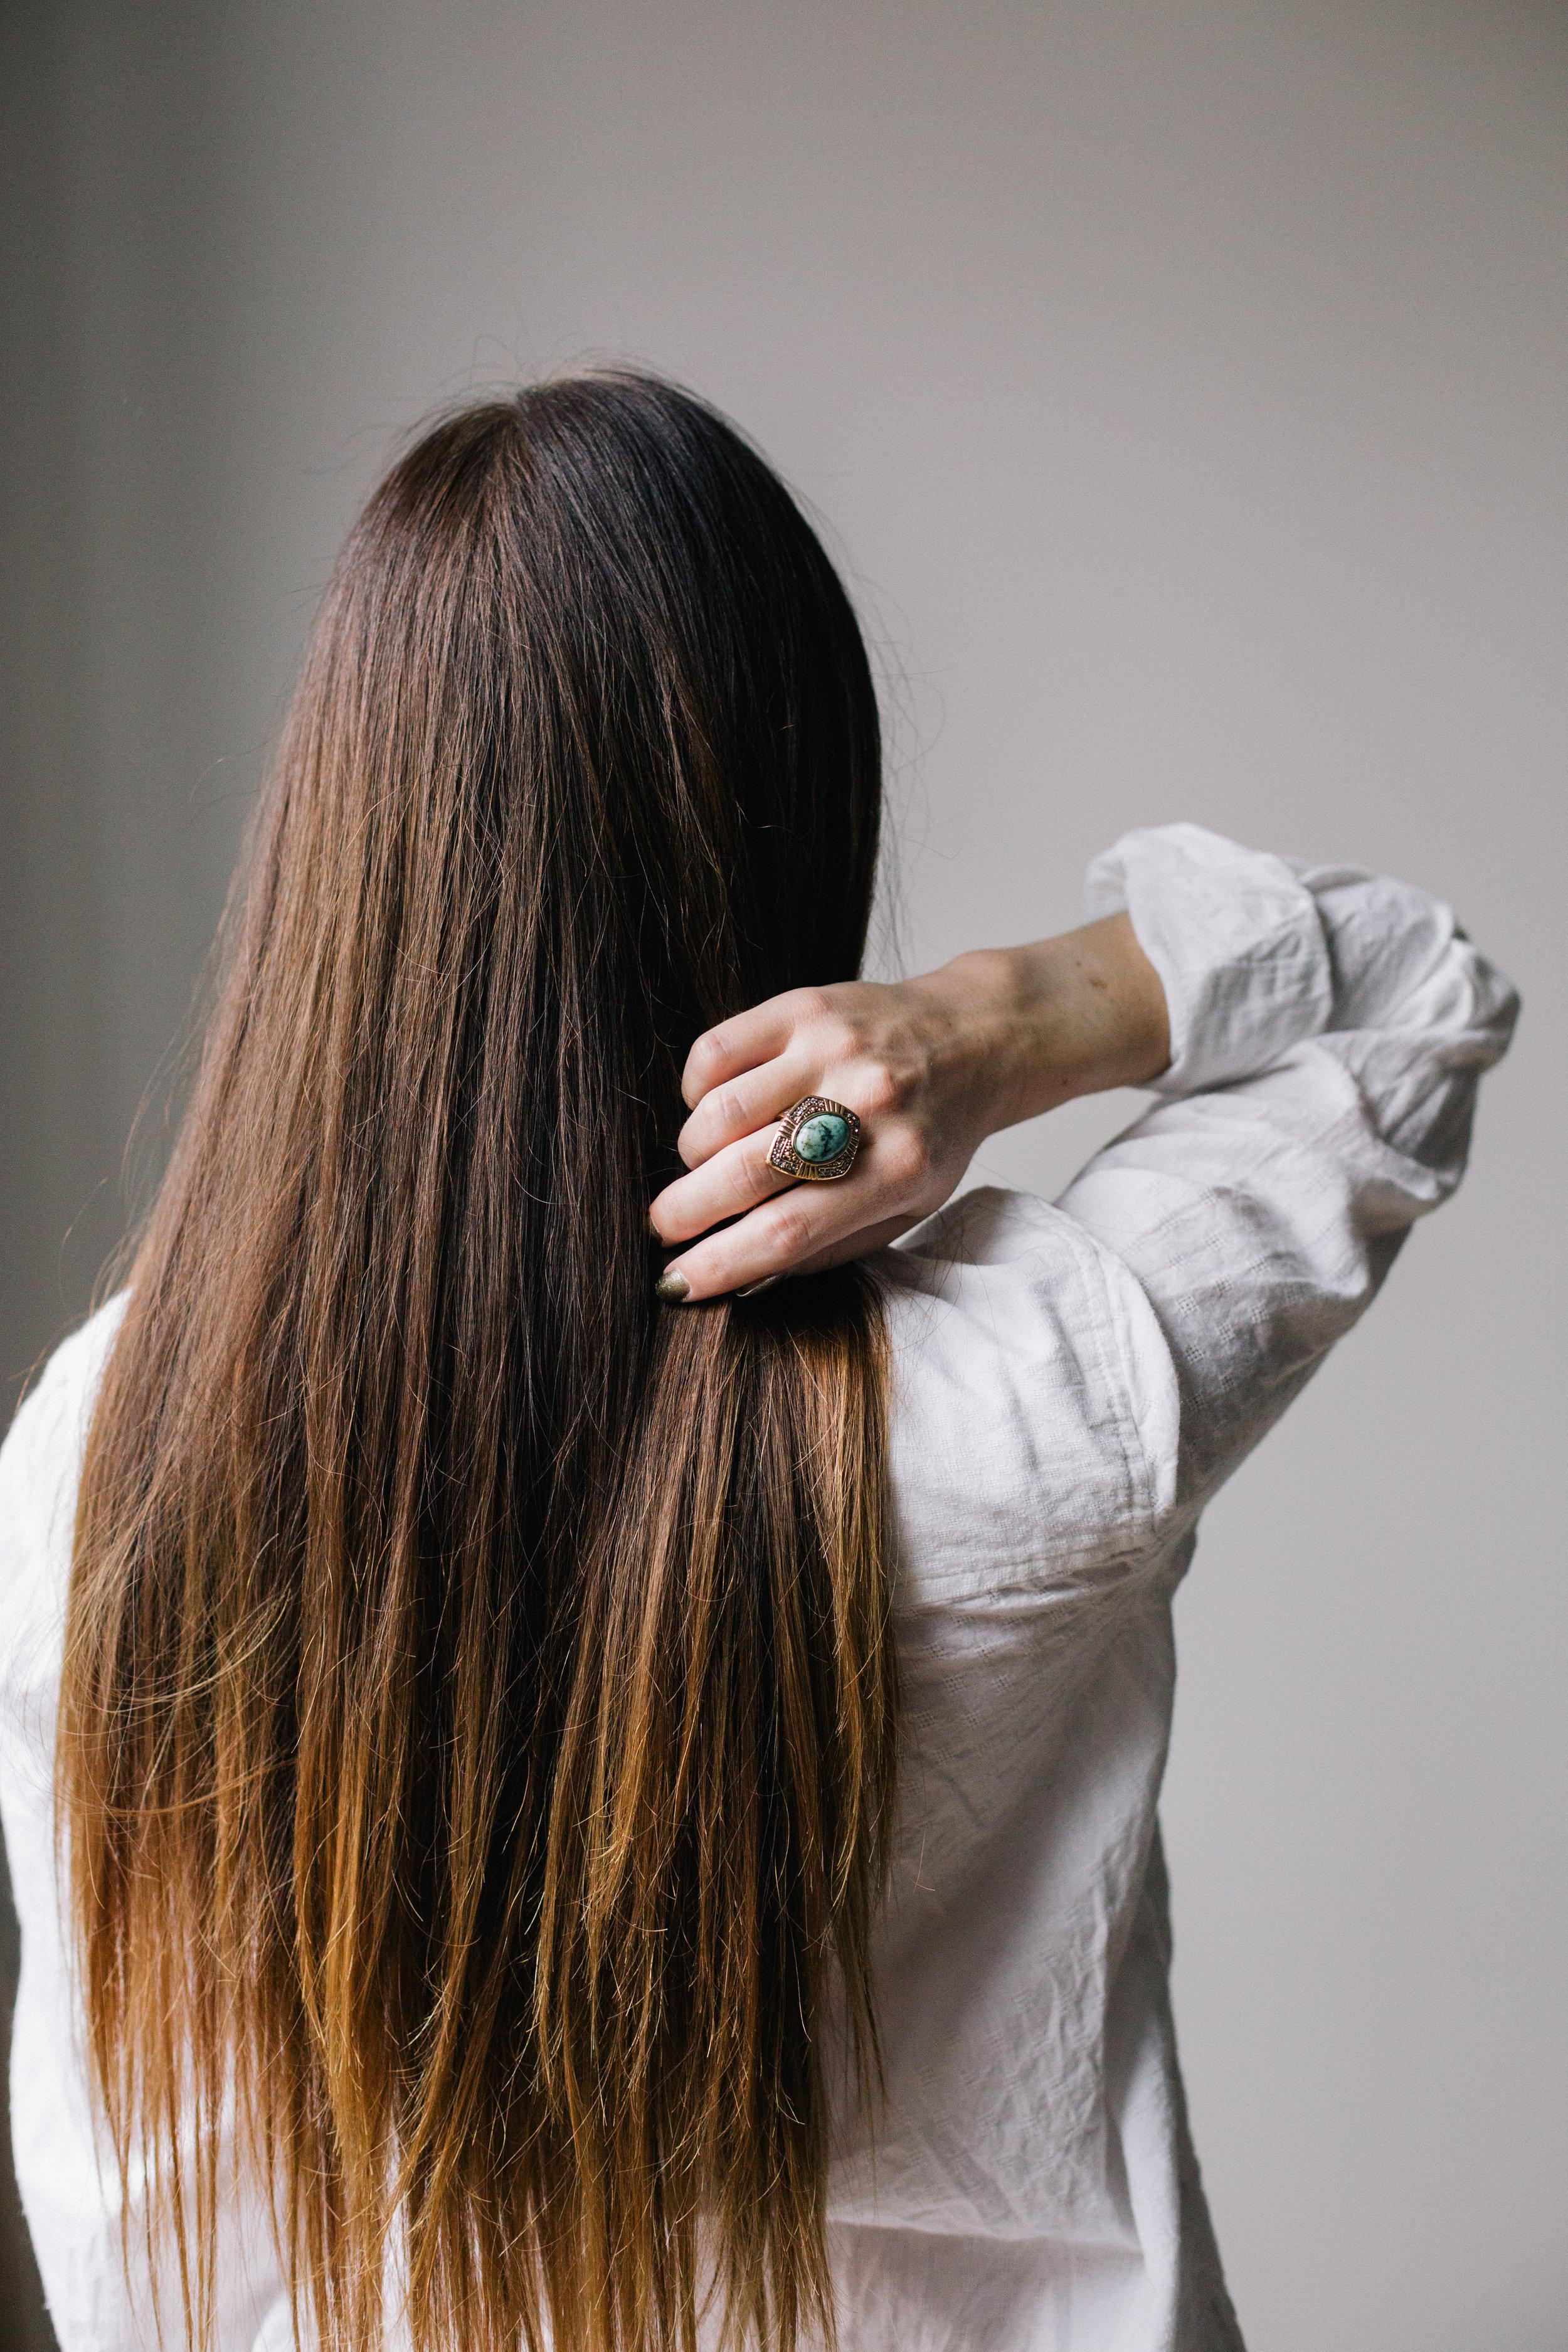 Long Brunette Hair Girl with Arm Behind Her.jpg